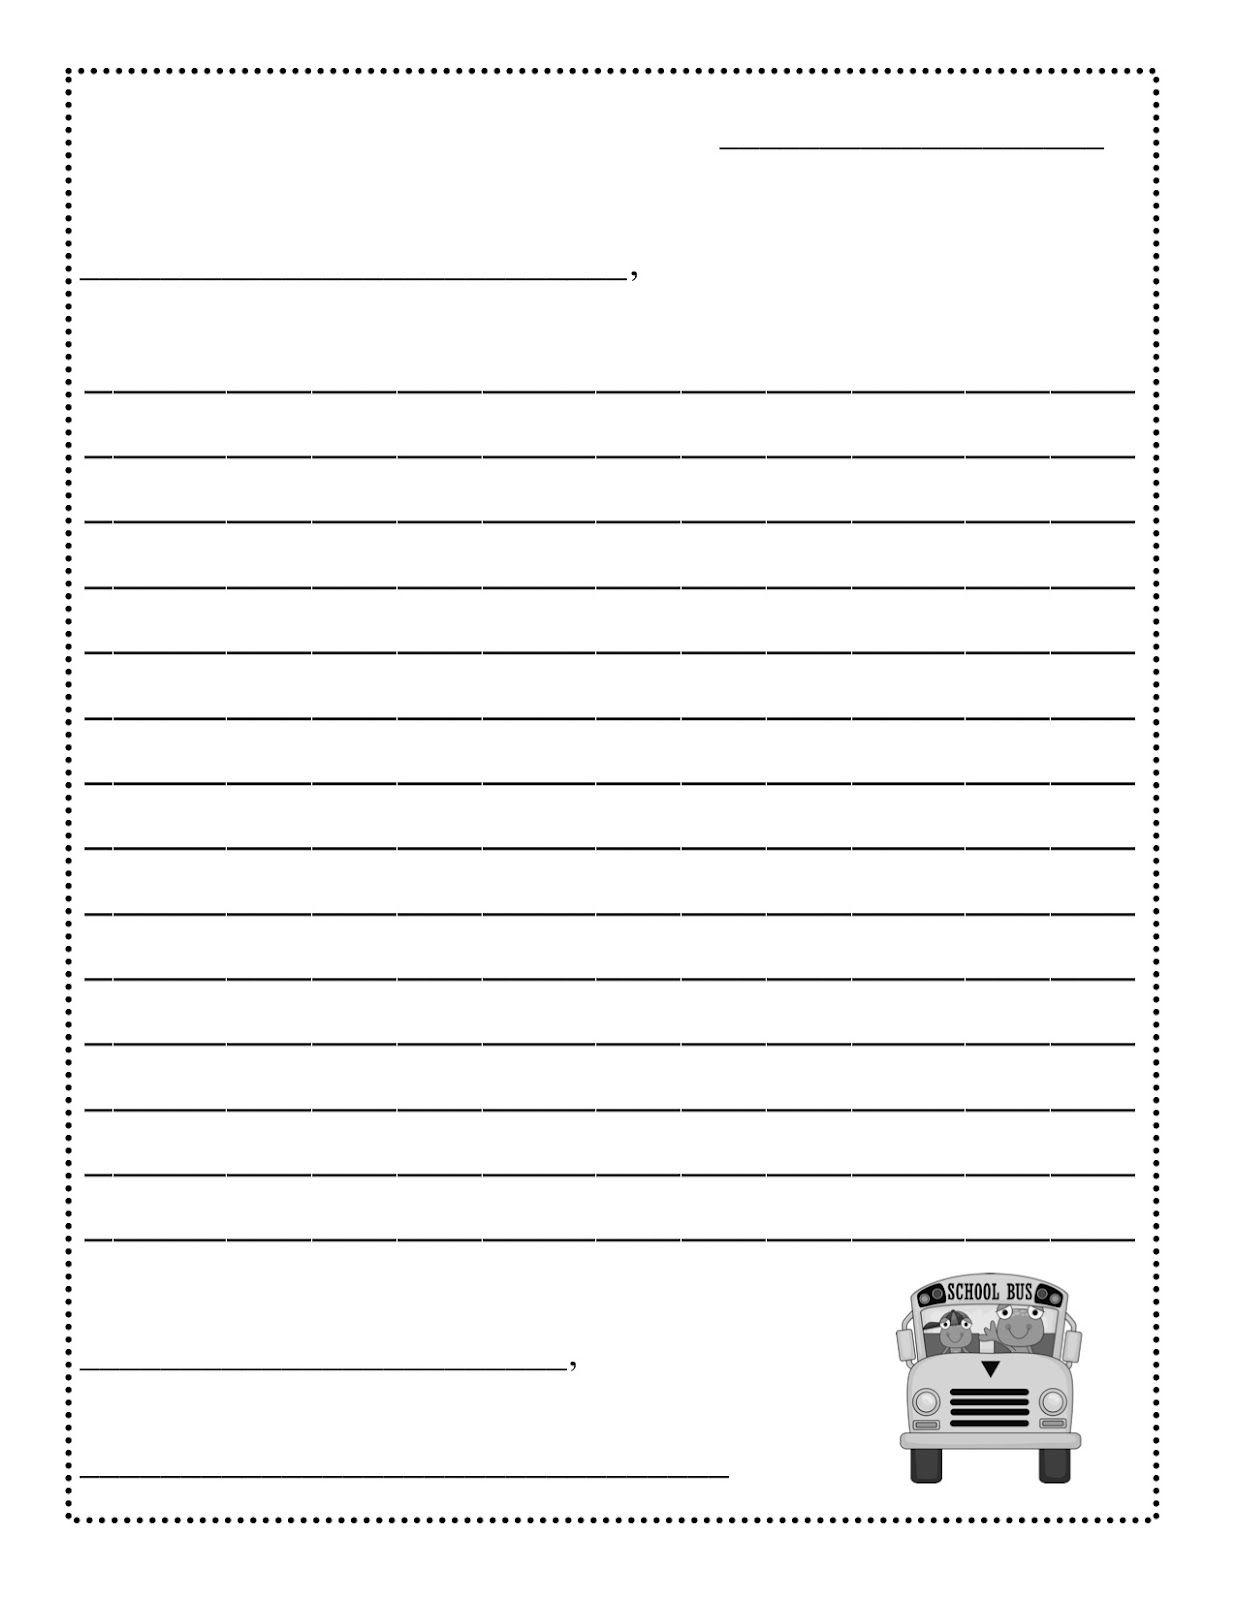 Friendly Letter Templateletter Writing Template Formal Letter Sample - Free Printable Letter Writing Templates